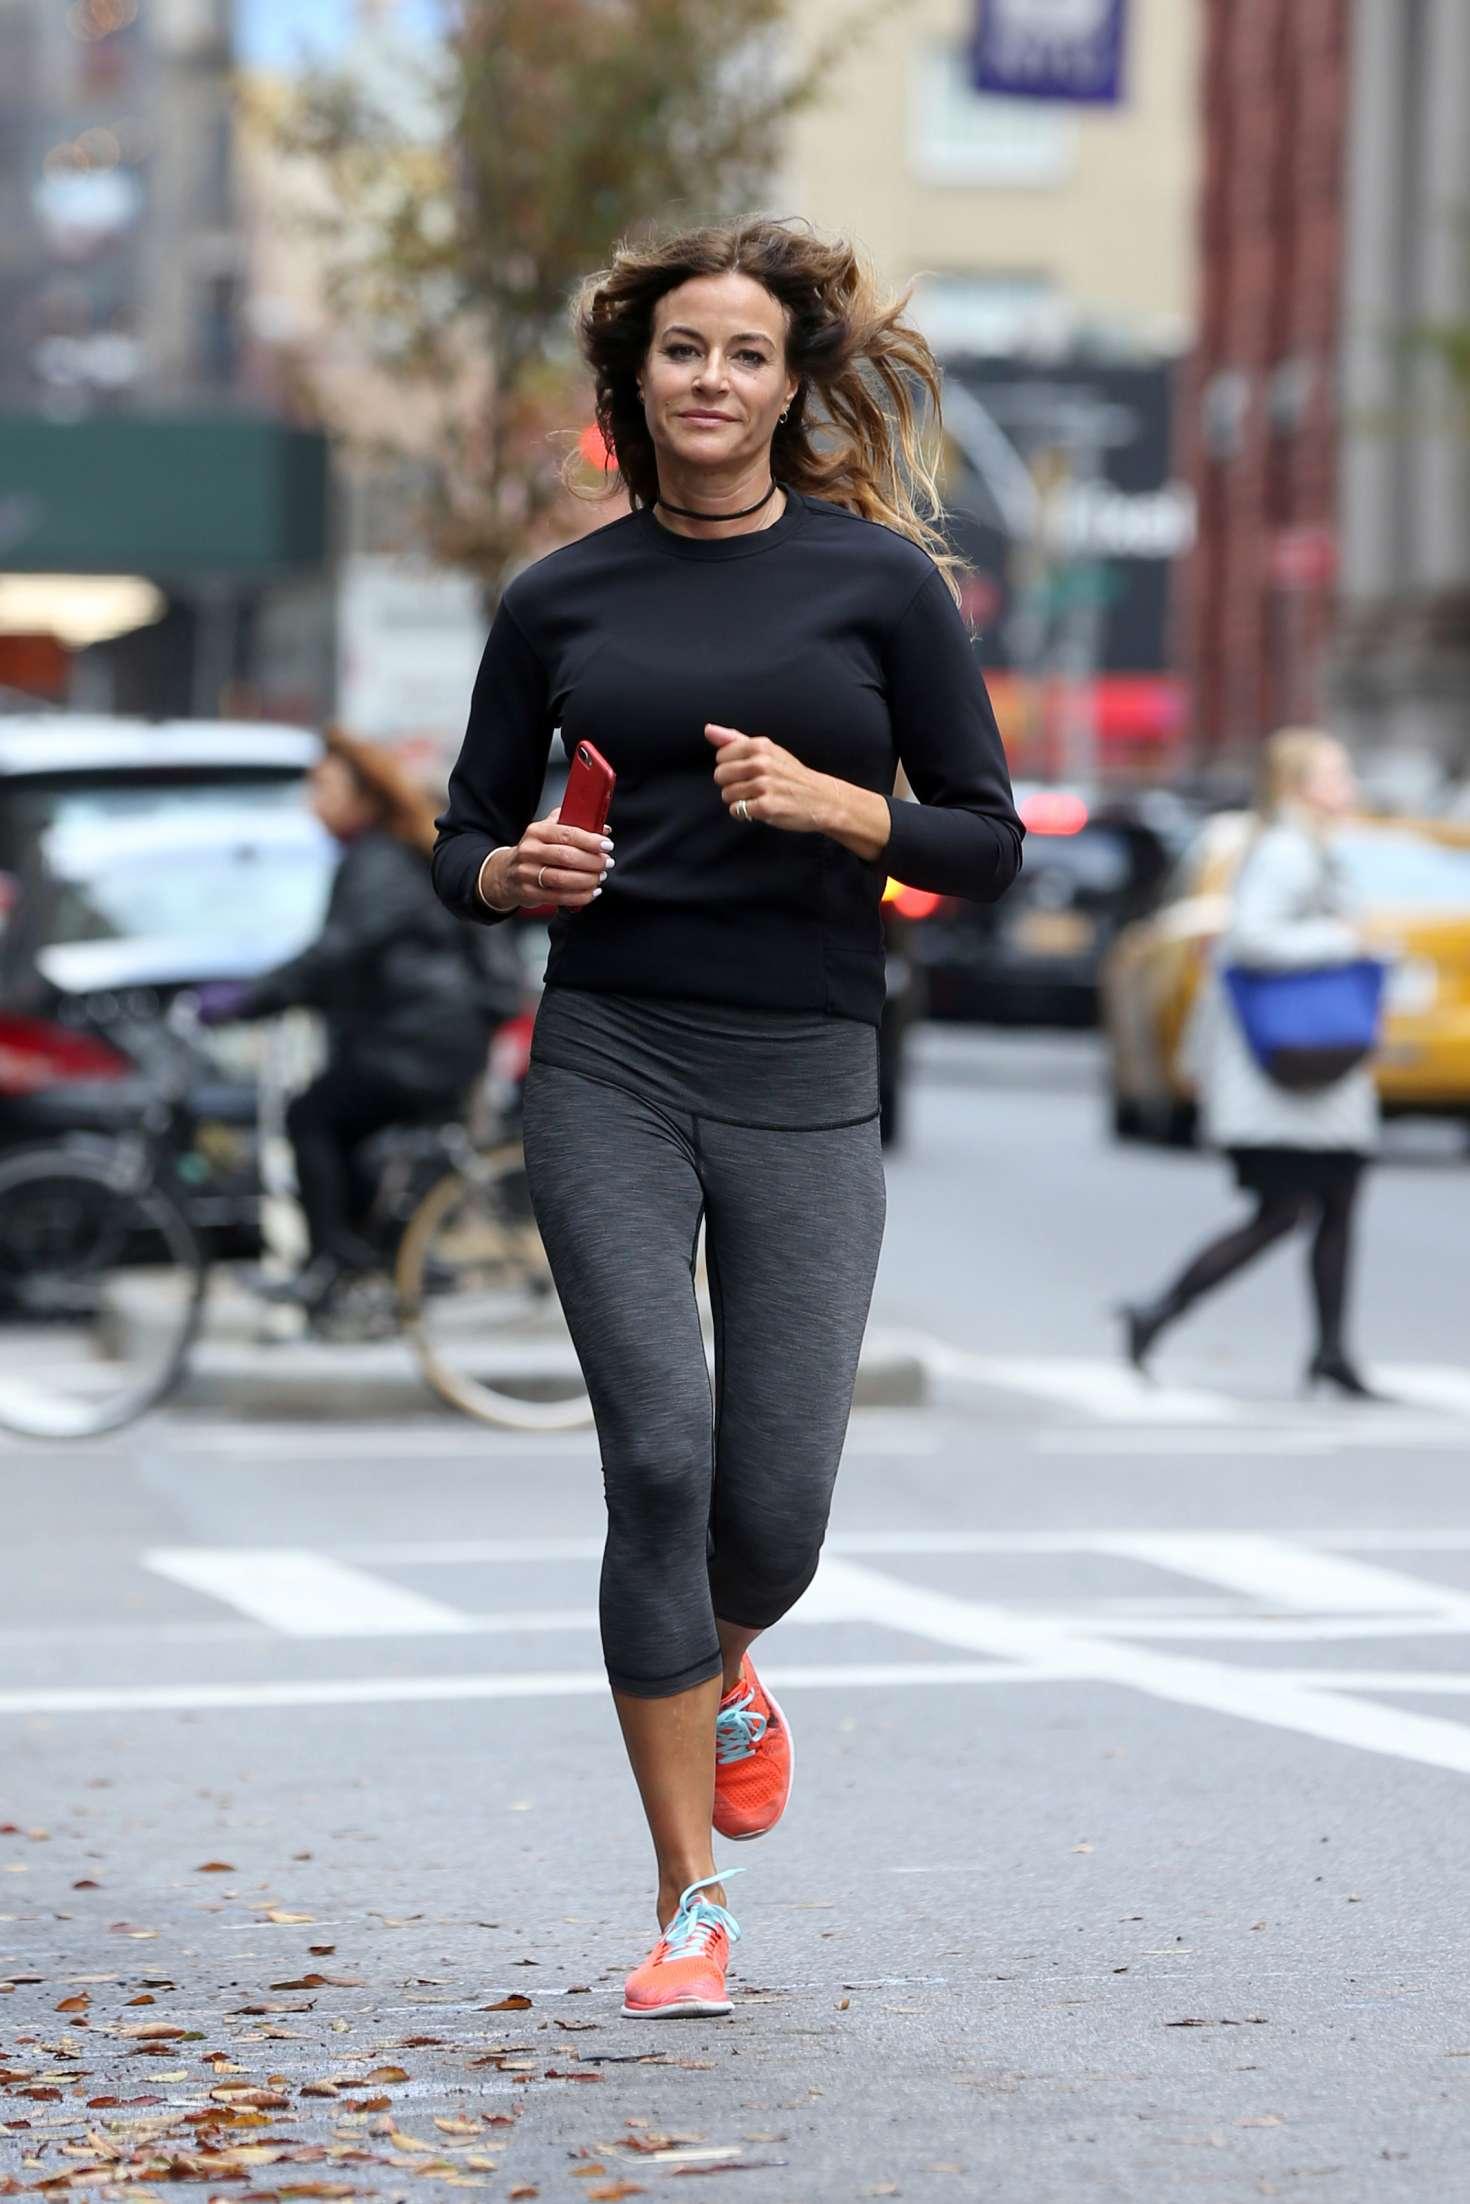 Kelly Bensimon 2017 : Kelly Bensimon: Goes for a jog in NYC -05